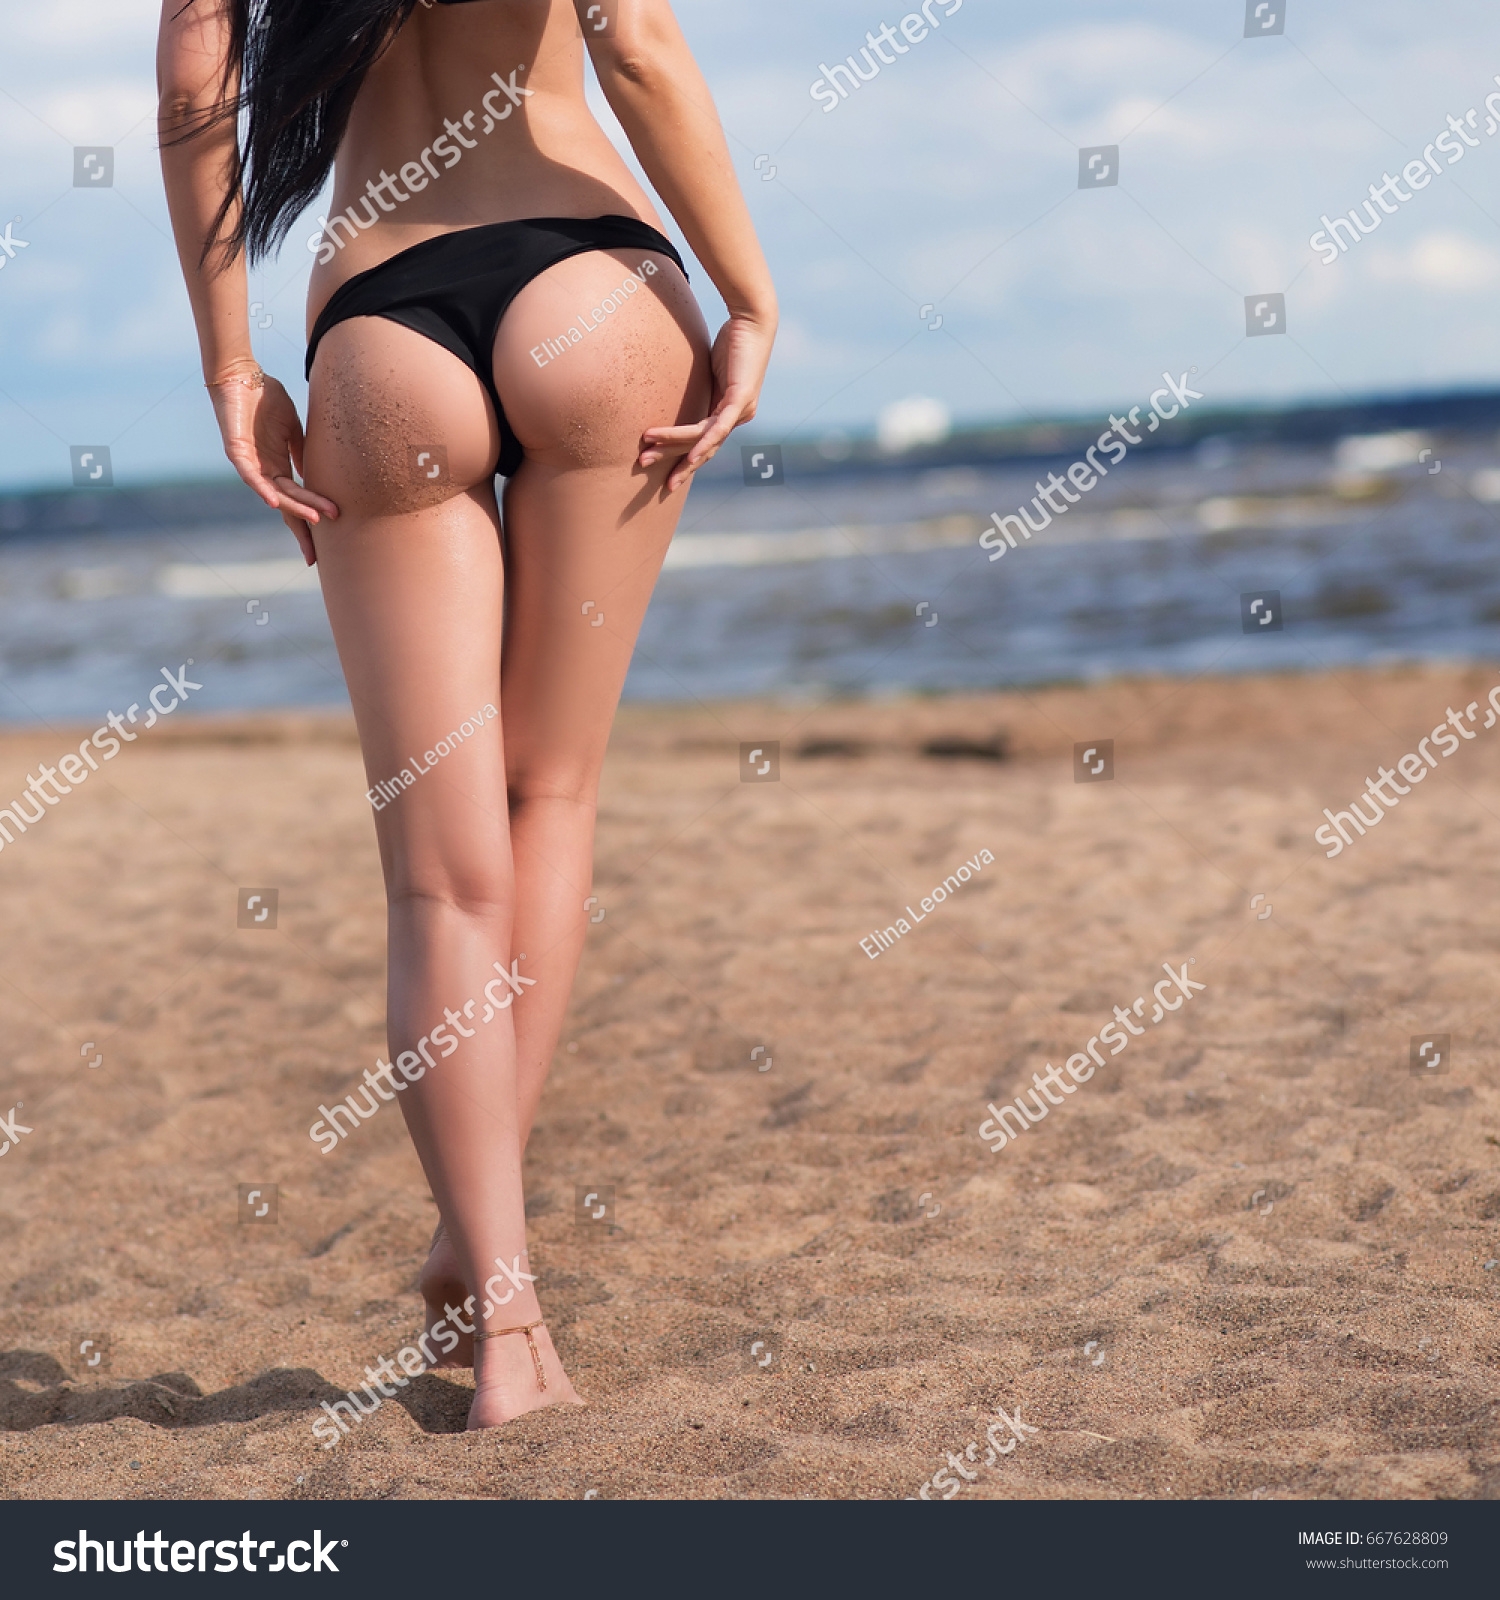 Sexual Woman On The Beach With Sand Ass In Bikini Summer